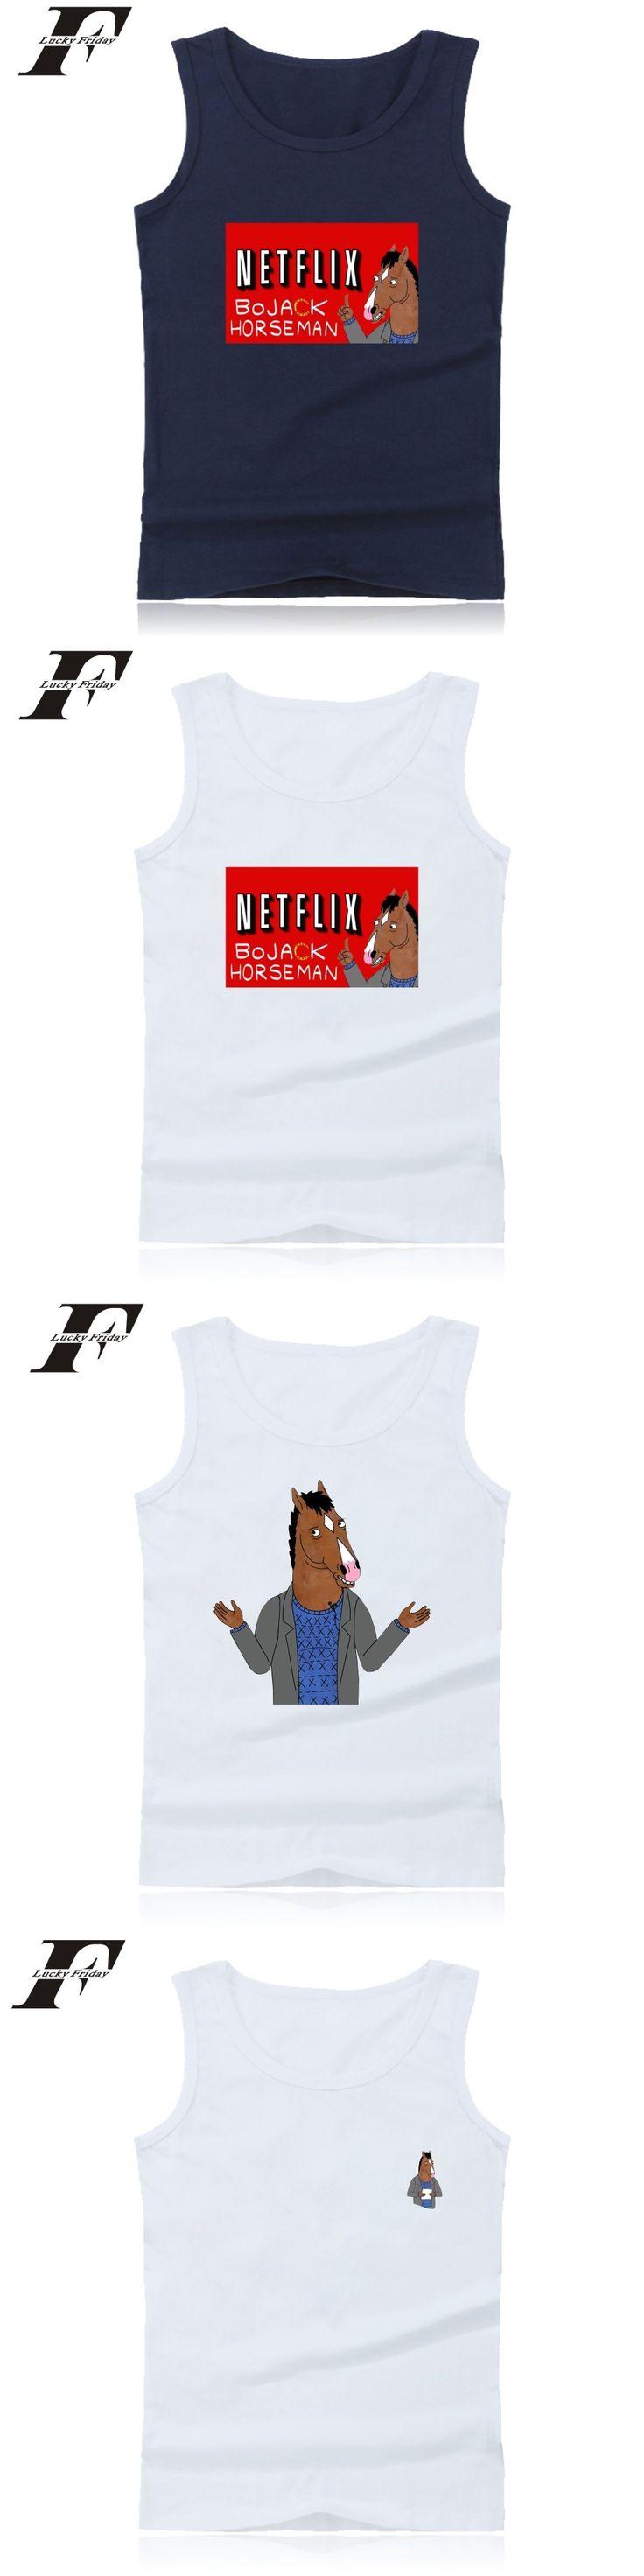 LUCKYFRIDAYF  shirt BoJack Horseman fitness Bodybuilding Tank Top Soft vest Cotton Funny  shirt Summer colete 4xl